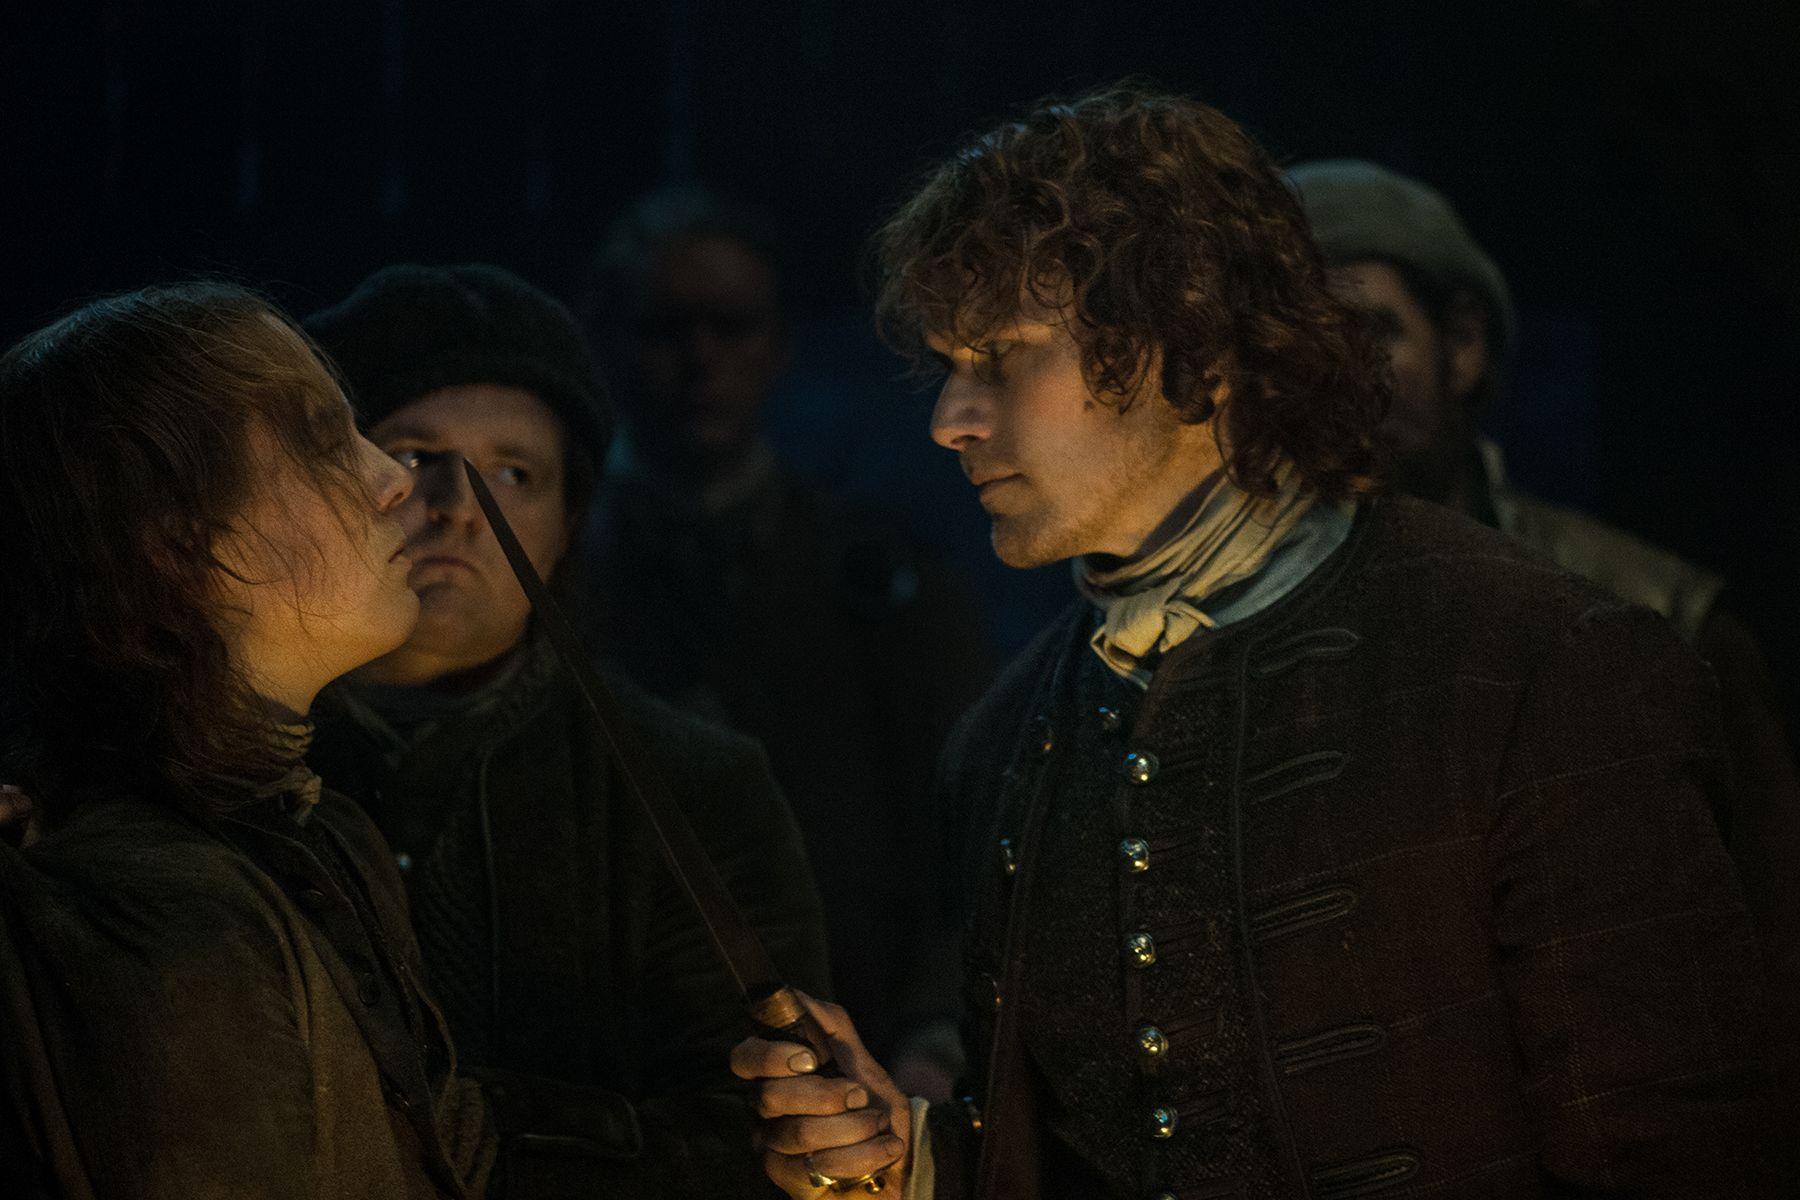 Oscar-Kennedy-as-William-Grey-Sam-Heughan-as-Jamie-Fraser-Episode-209.jpg (1800×1200)